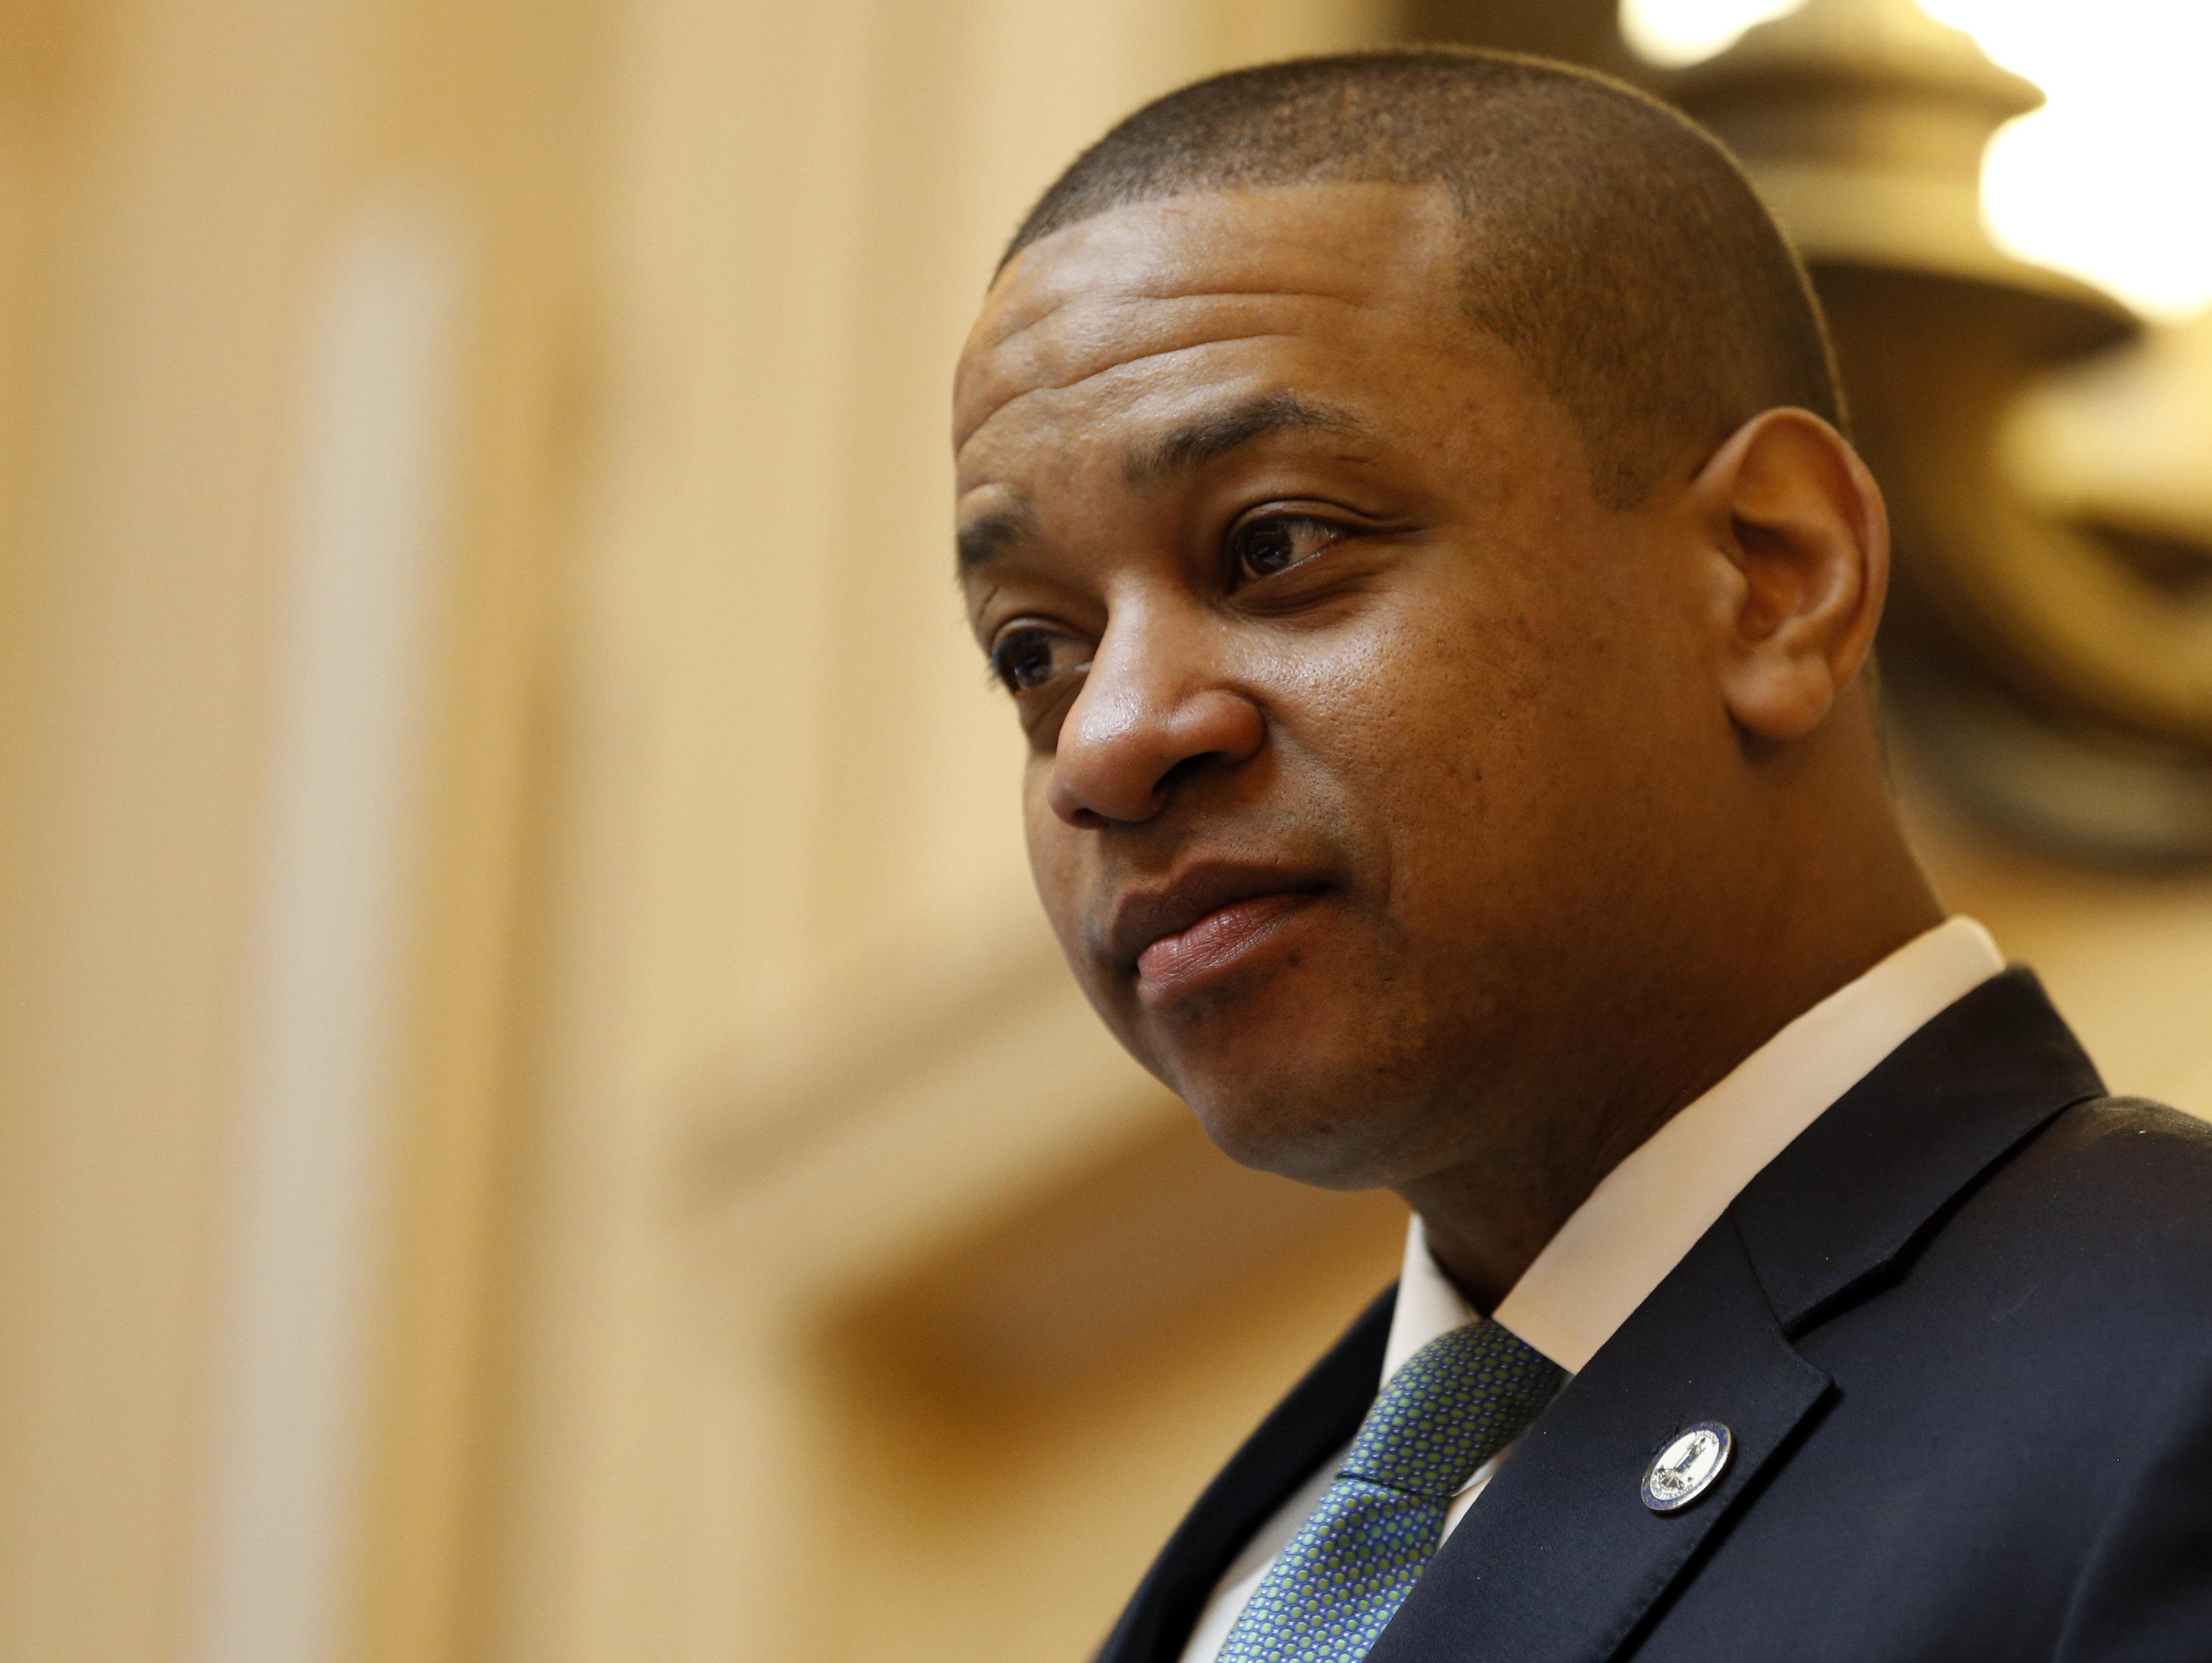 Virginia Lt. Gov. Justin Fairfax, seen presiding over the state Senate in Richmond on Monday, faces calls...